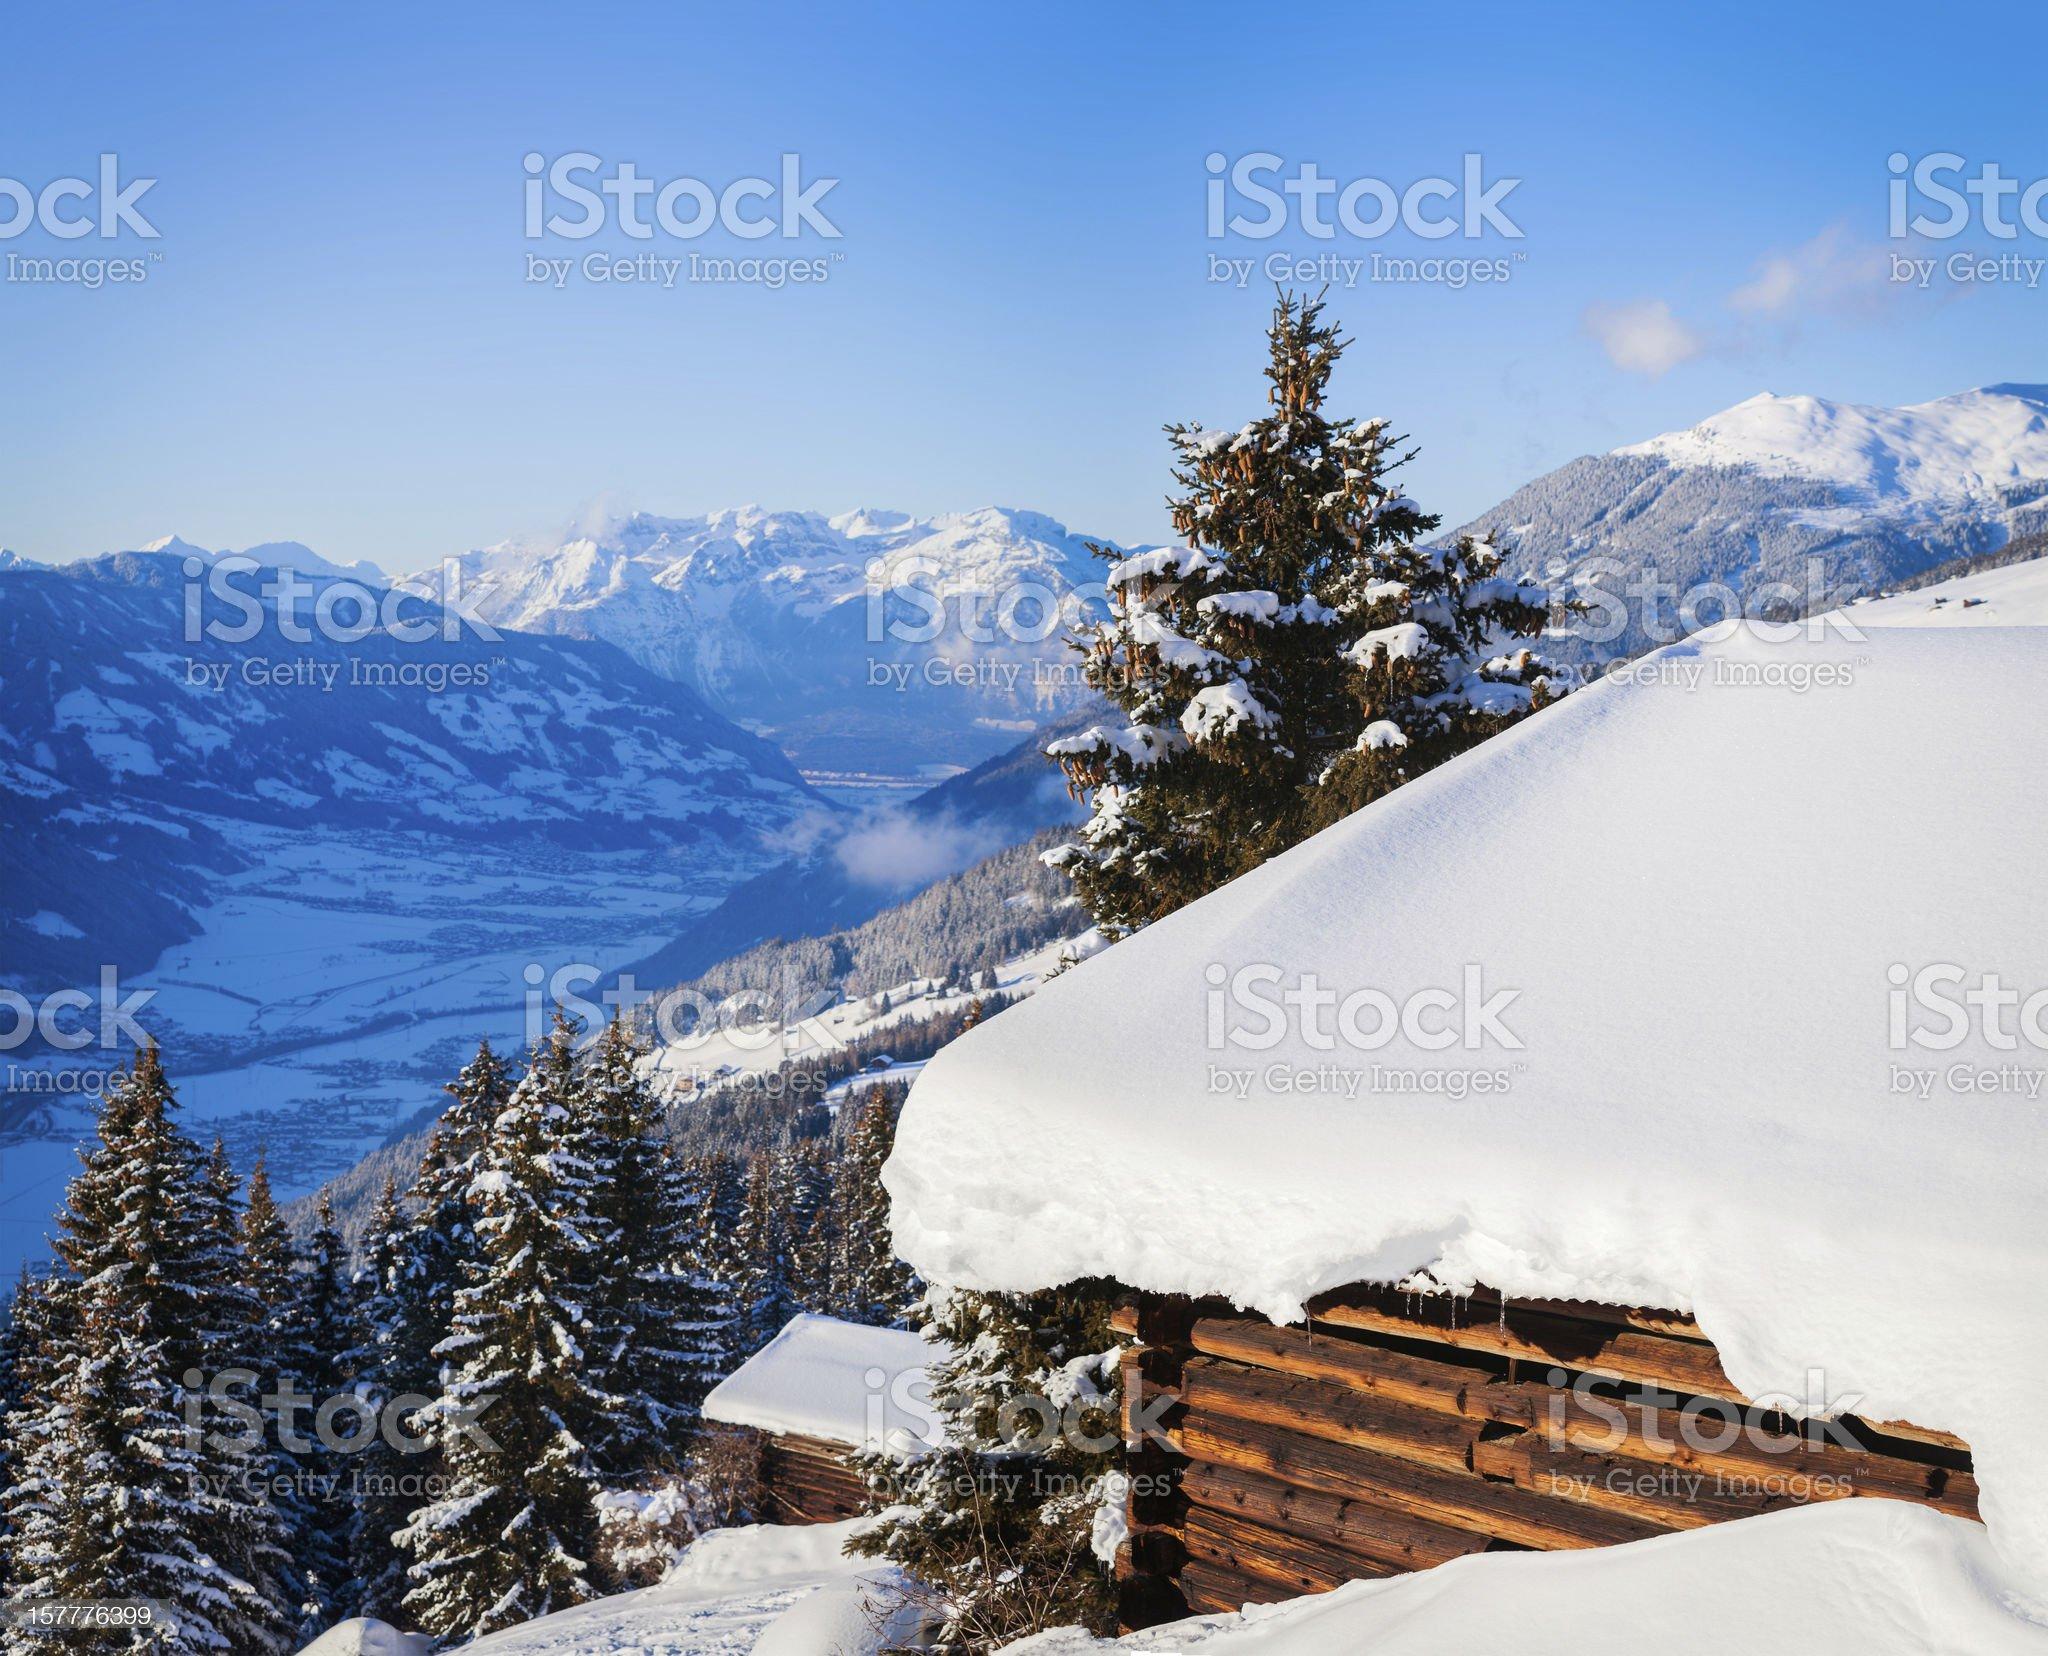 Alpine scenery royalty-free stock photo